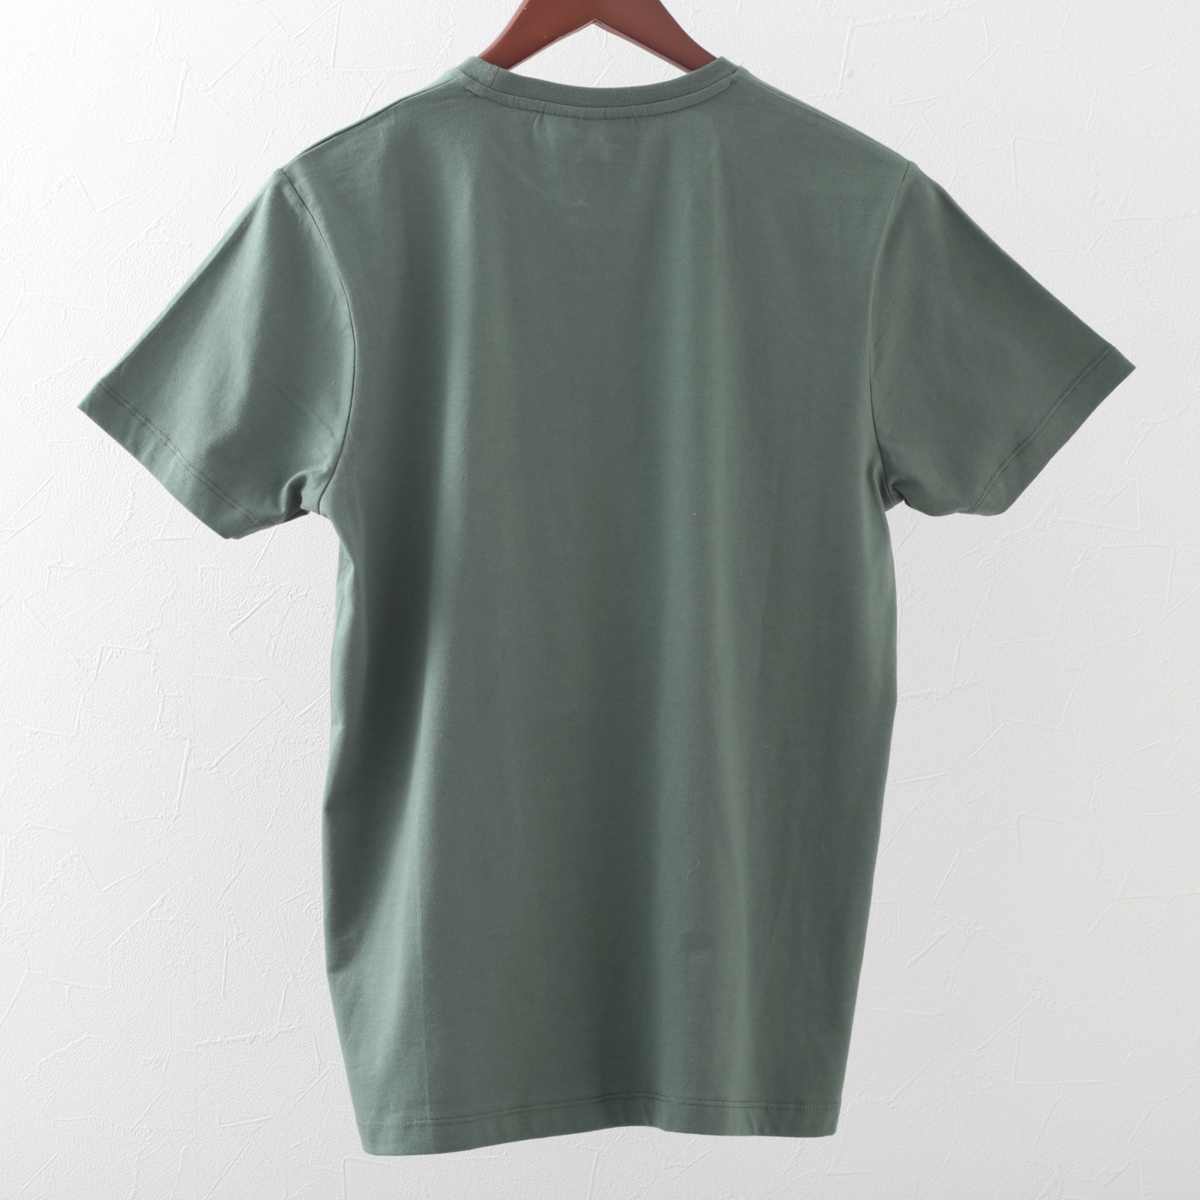 Tシャツ コンバットグリーン グラフィック プリント モッズファッション メンズ Merc London メルクロンドン